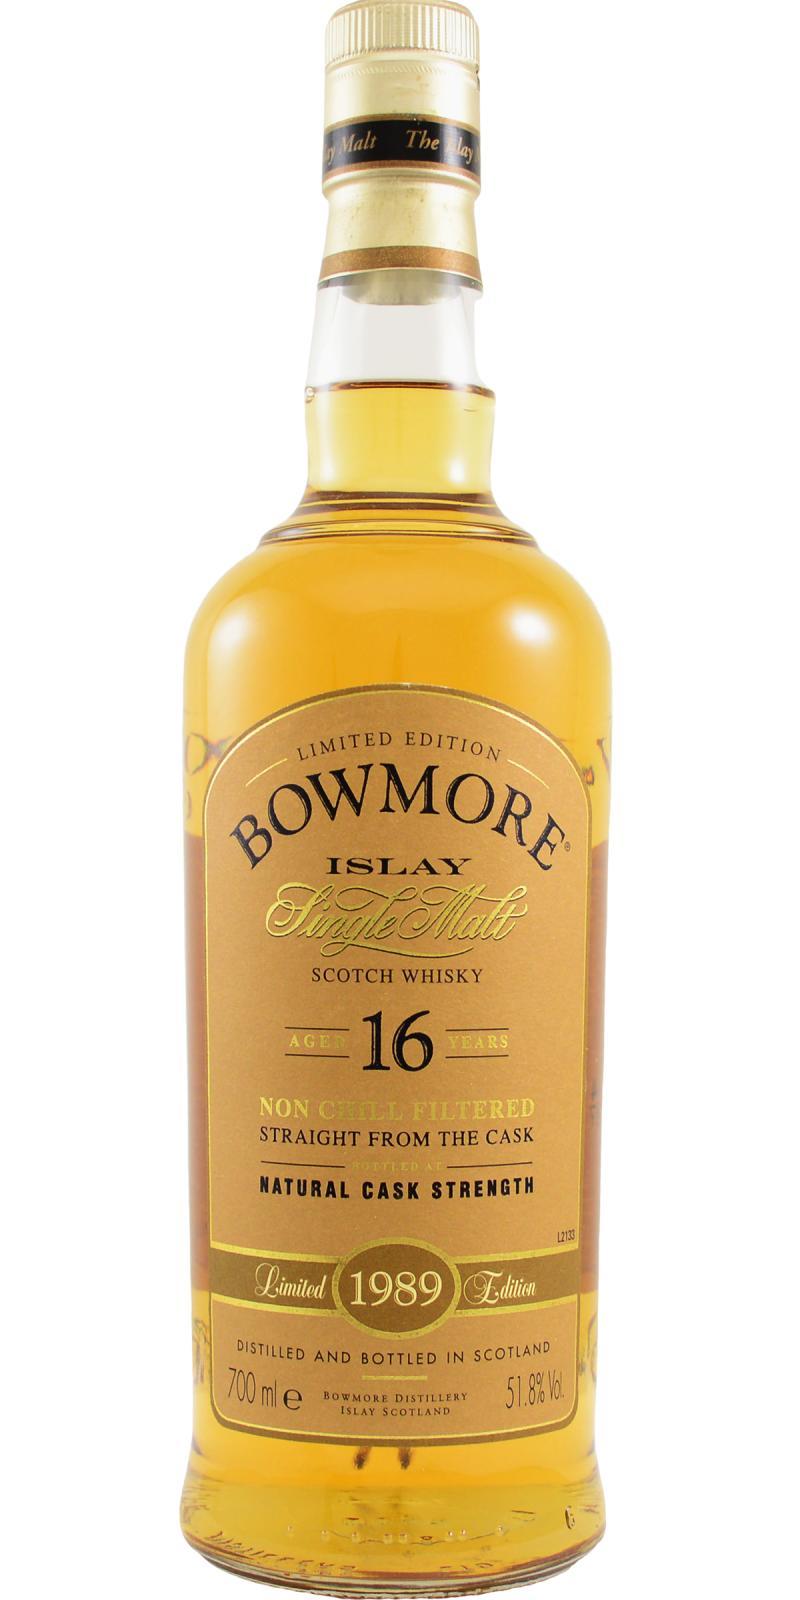 Bowmore 1989 Bourbon Matured